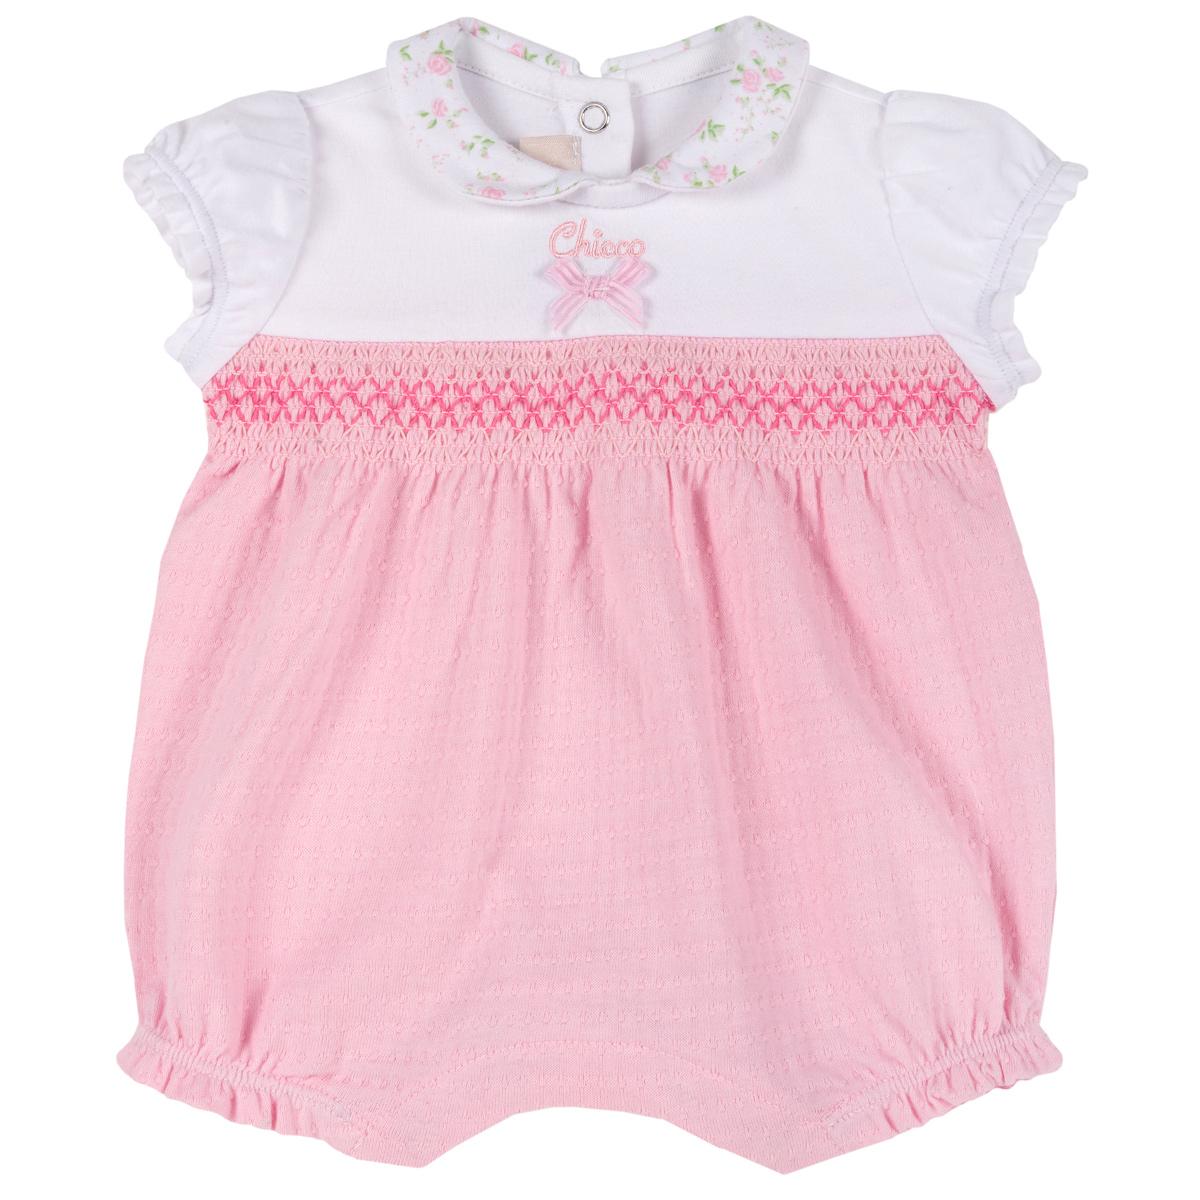 Body Pentru Bebelusi Chicco, Alb Cu Roz, 50822 imagine